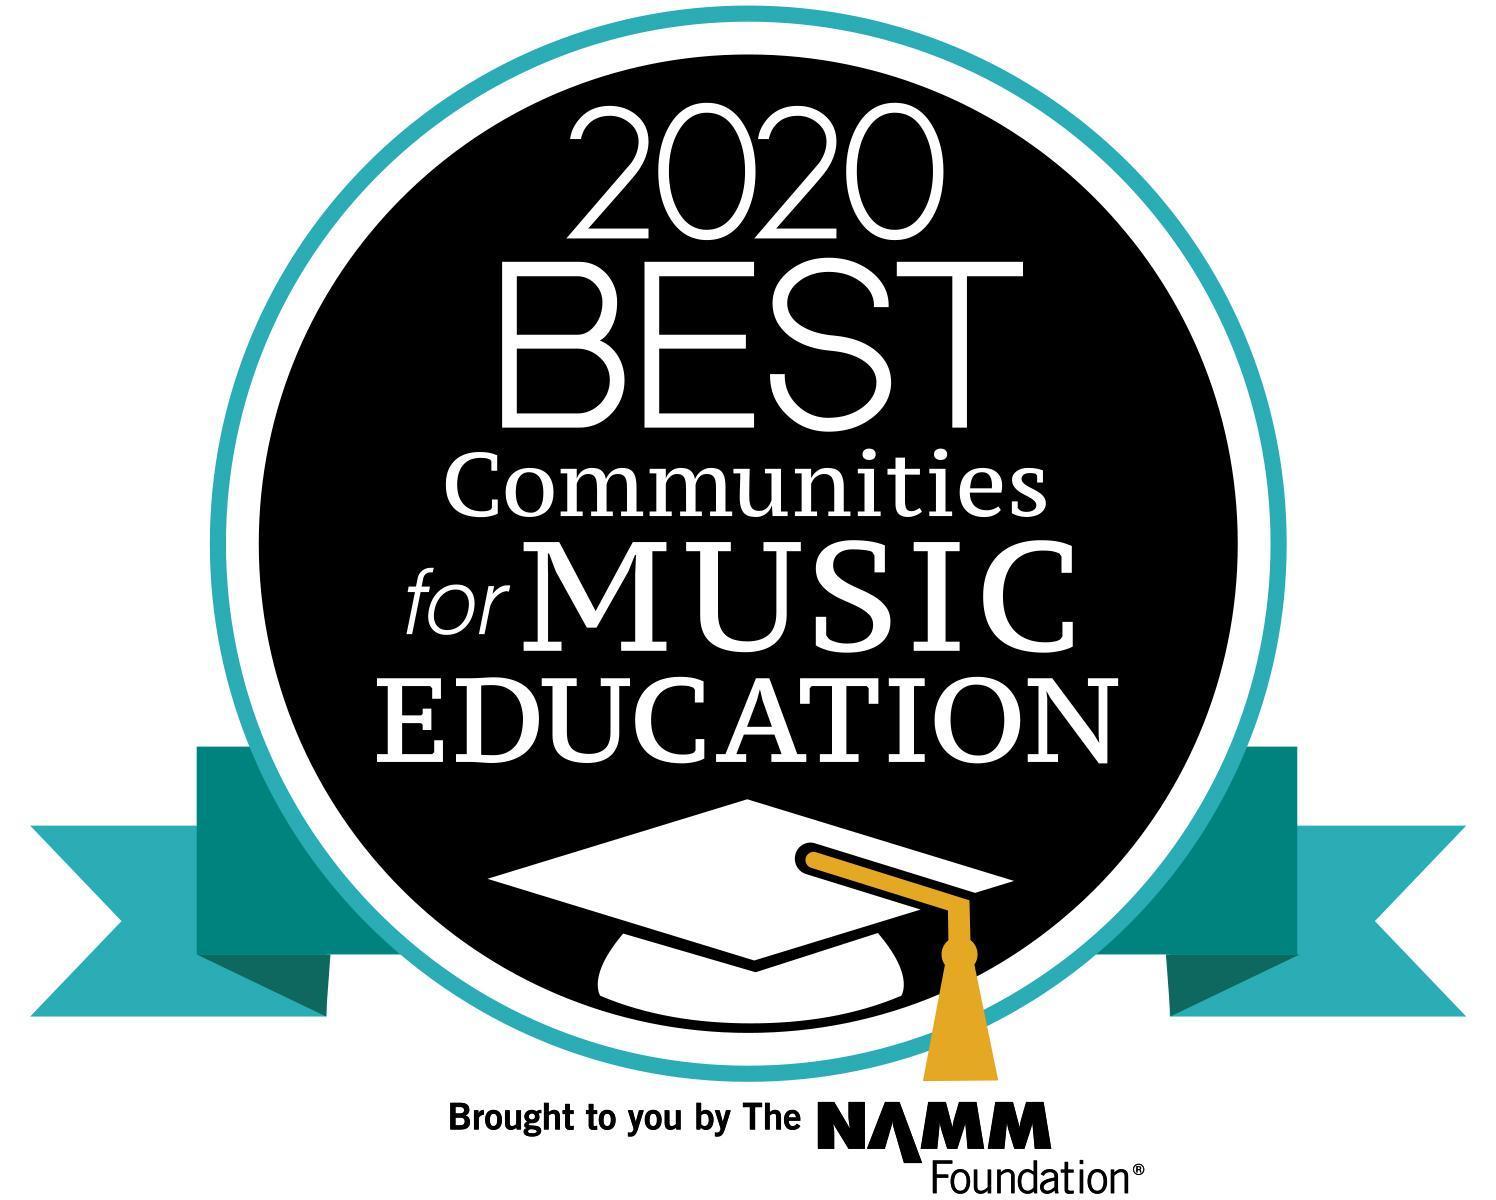 2020 NAMM Best Communities for Music Education